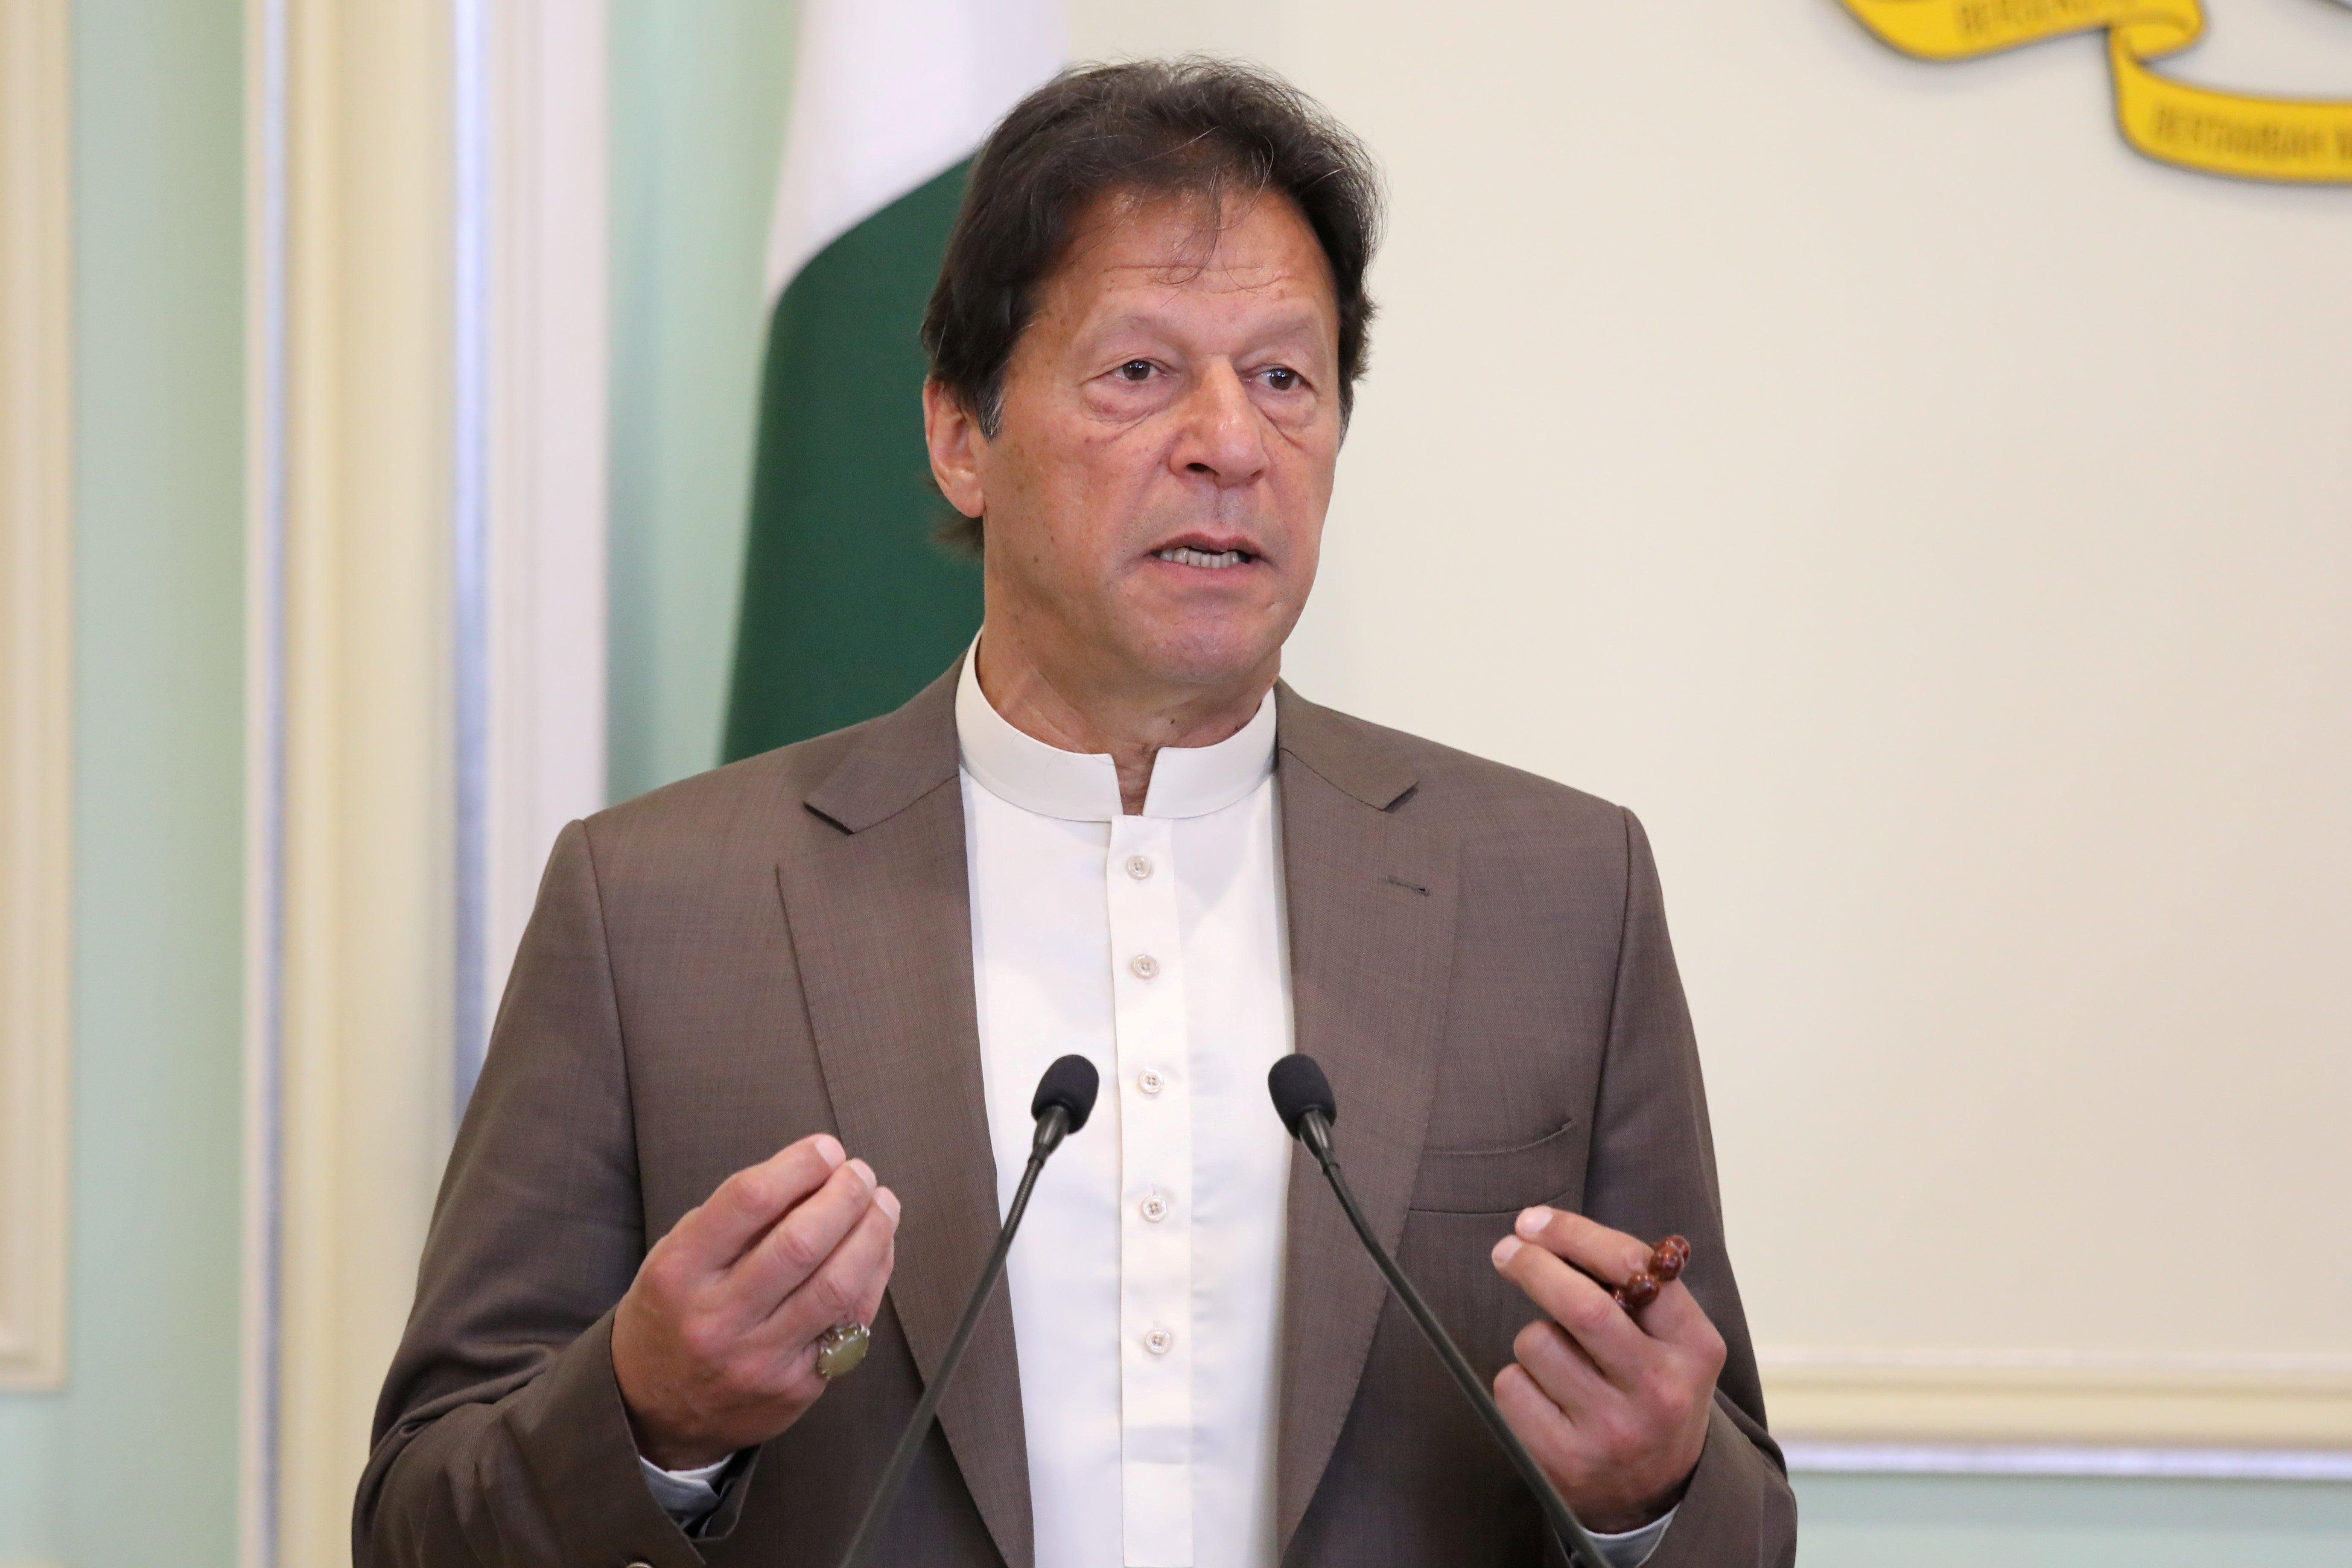 independent.co.uk - Mayank Aggarwal - Imran Khan asks Facebook for ban on Islamophobia 'just like ban on Holocaust denial'